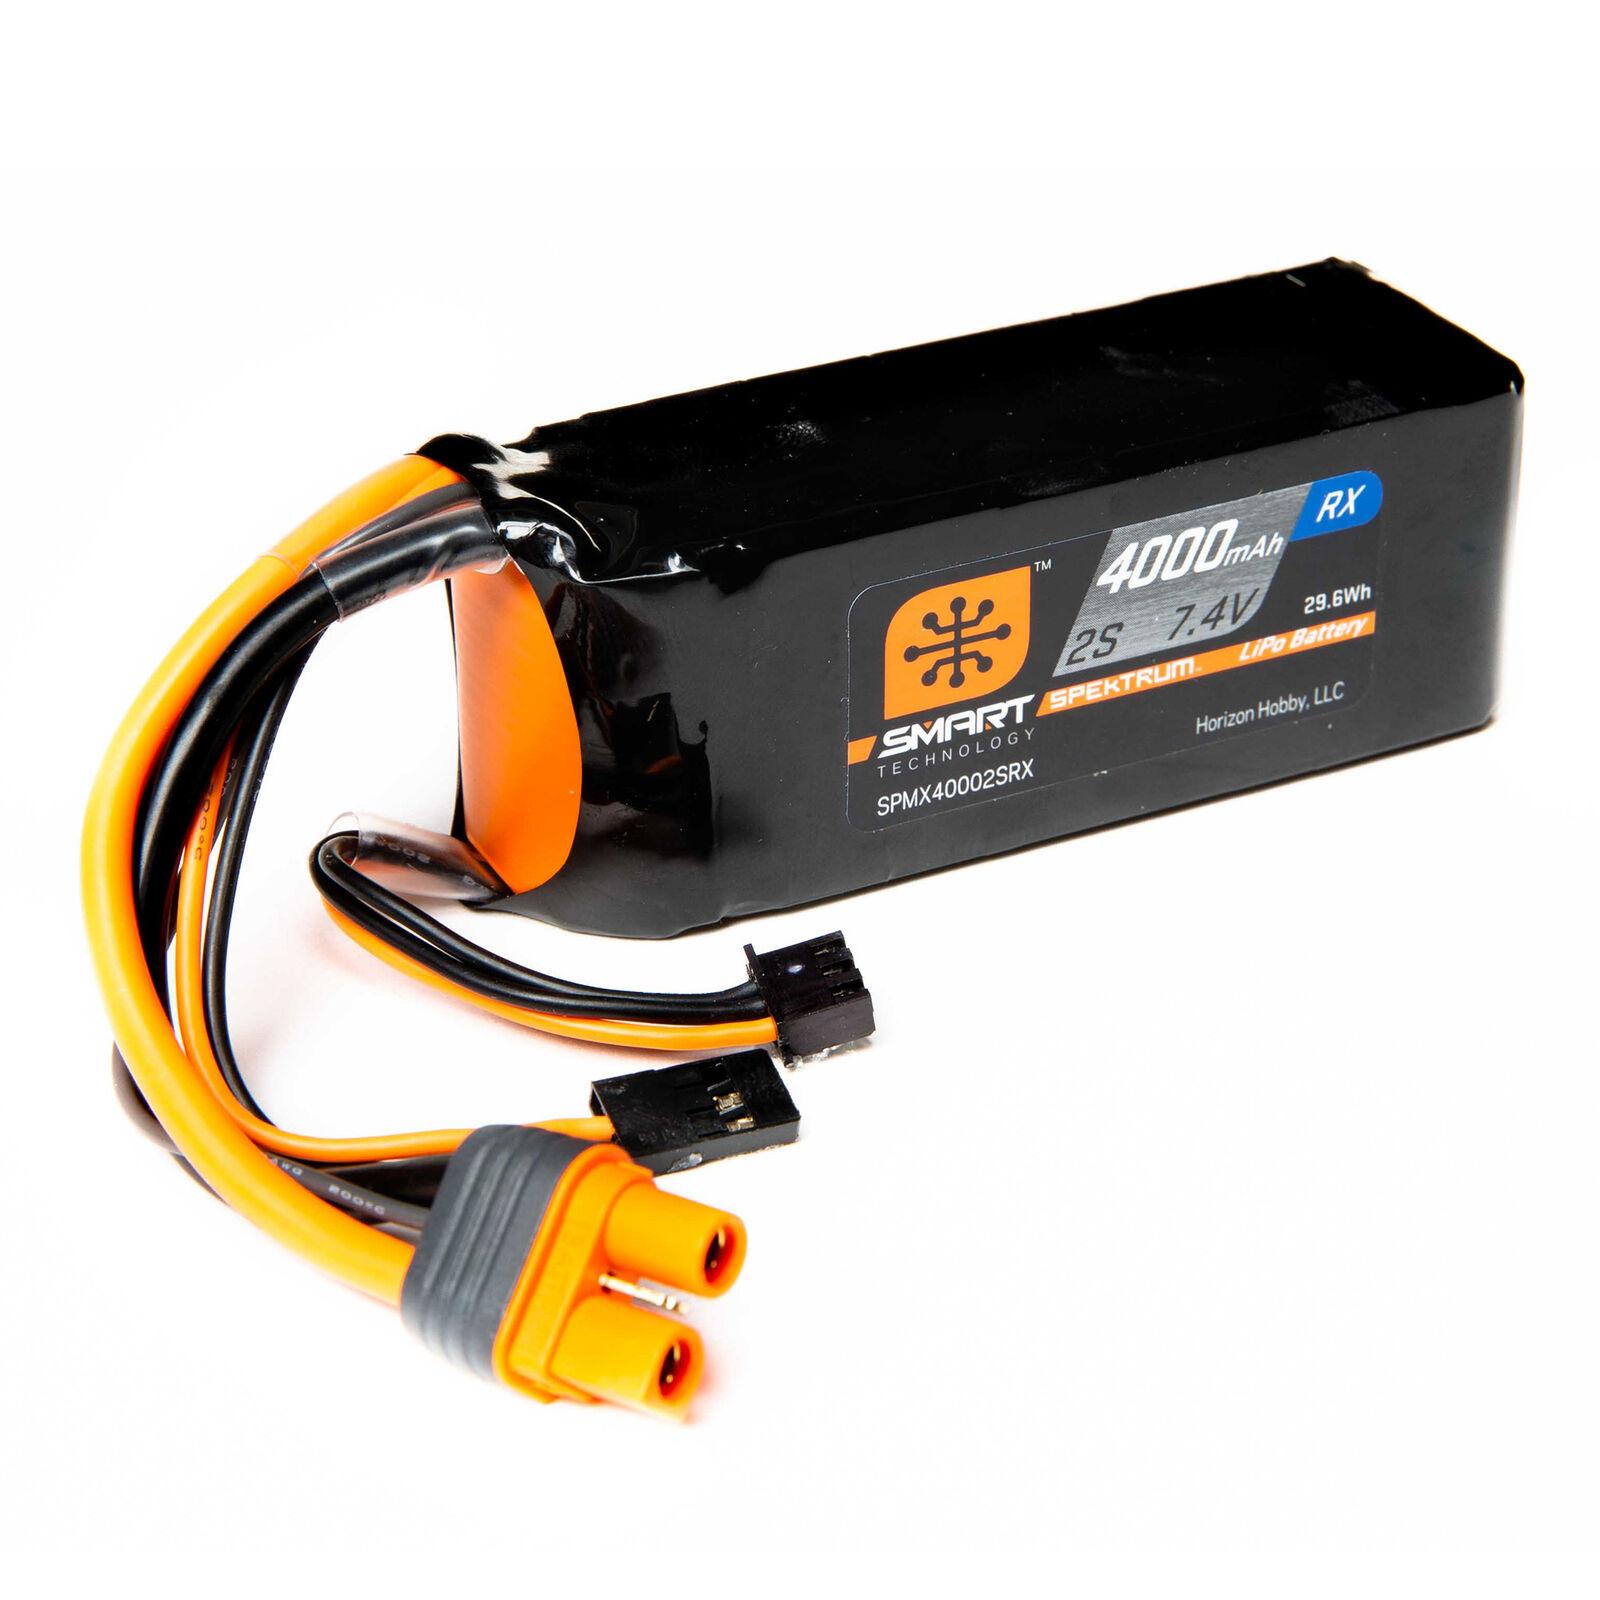 7.4V 4000mAh 2S 15C Smart LiPo Receiver Battery: Universal Receiver, IC3